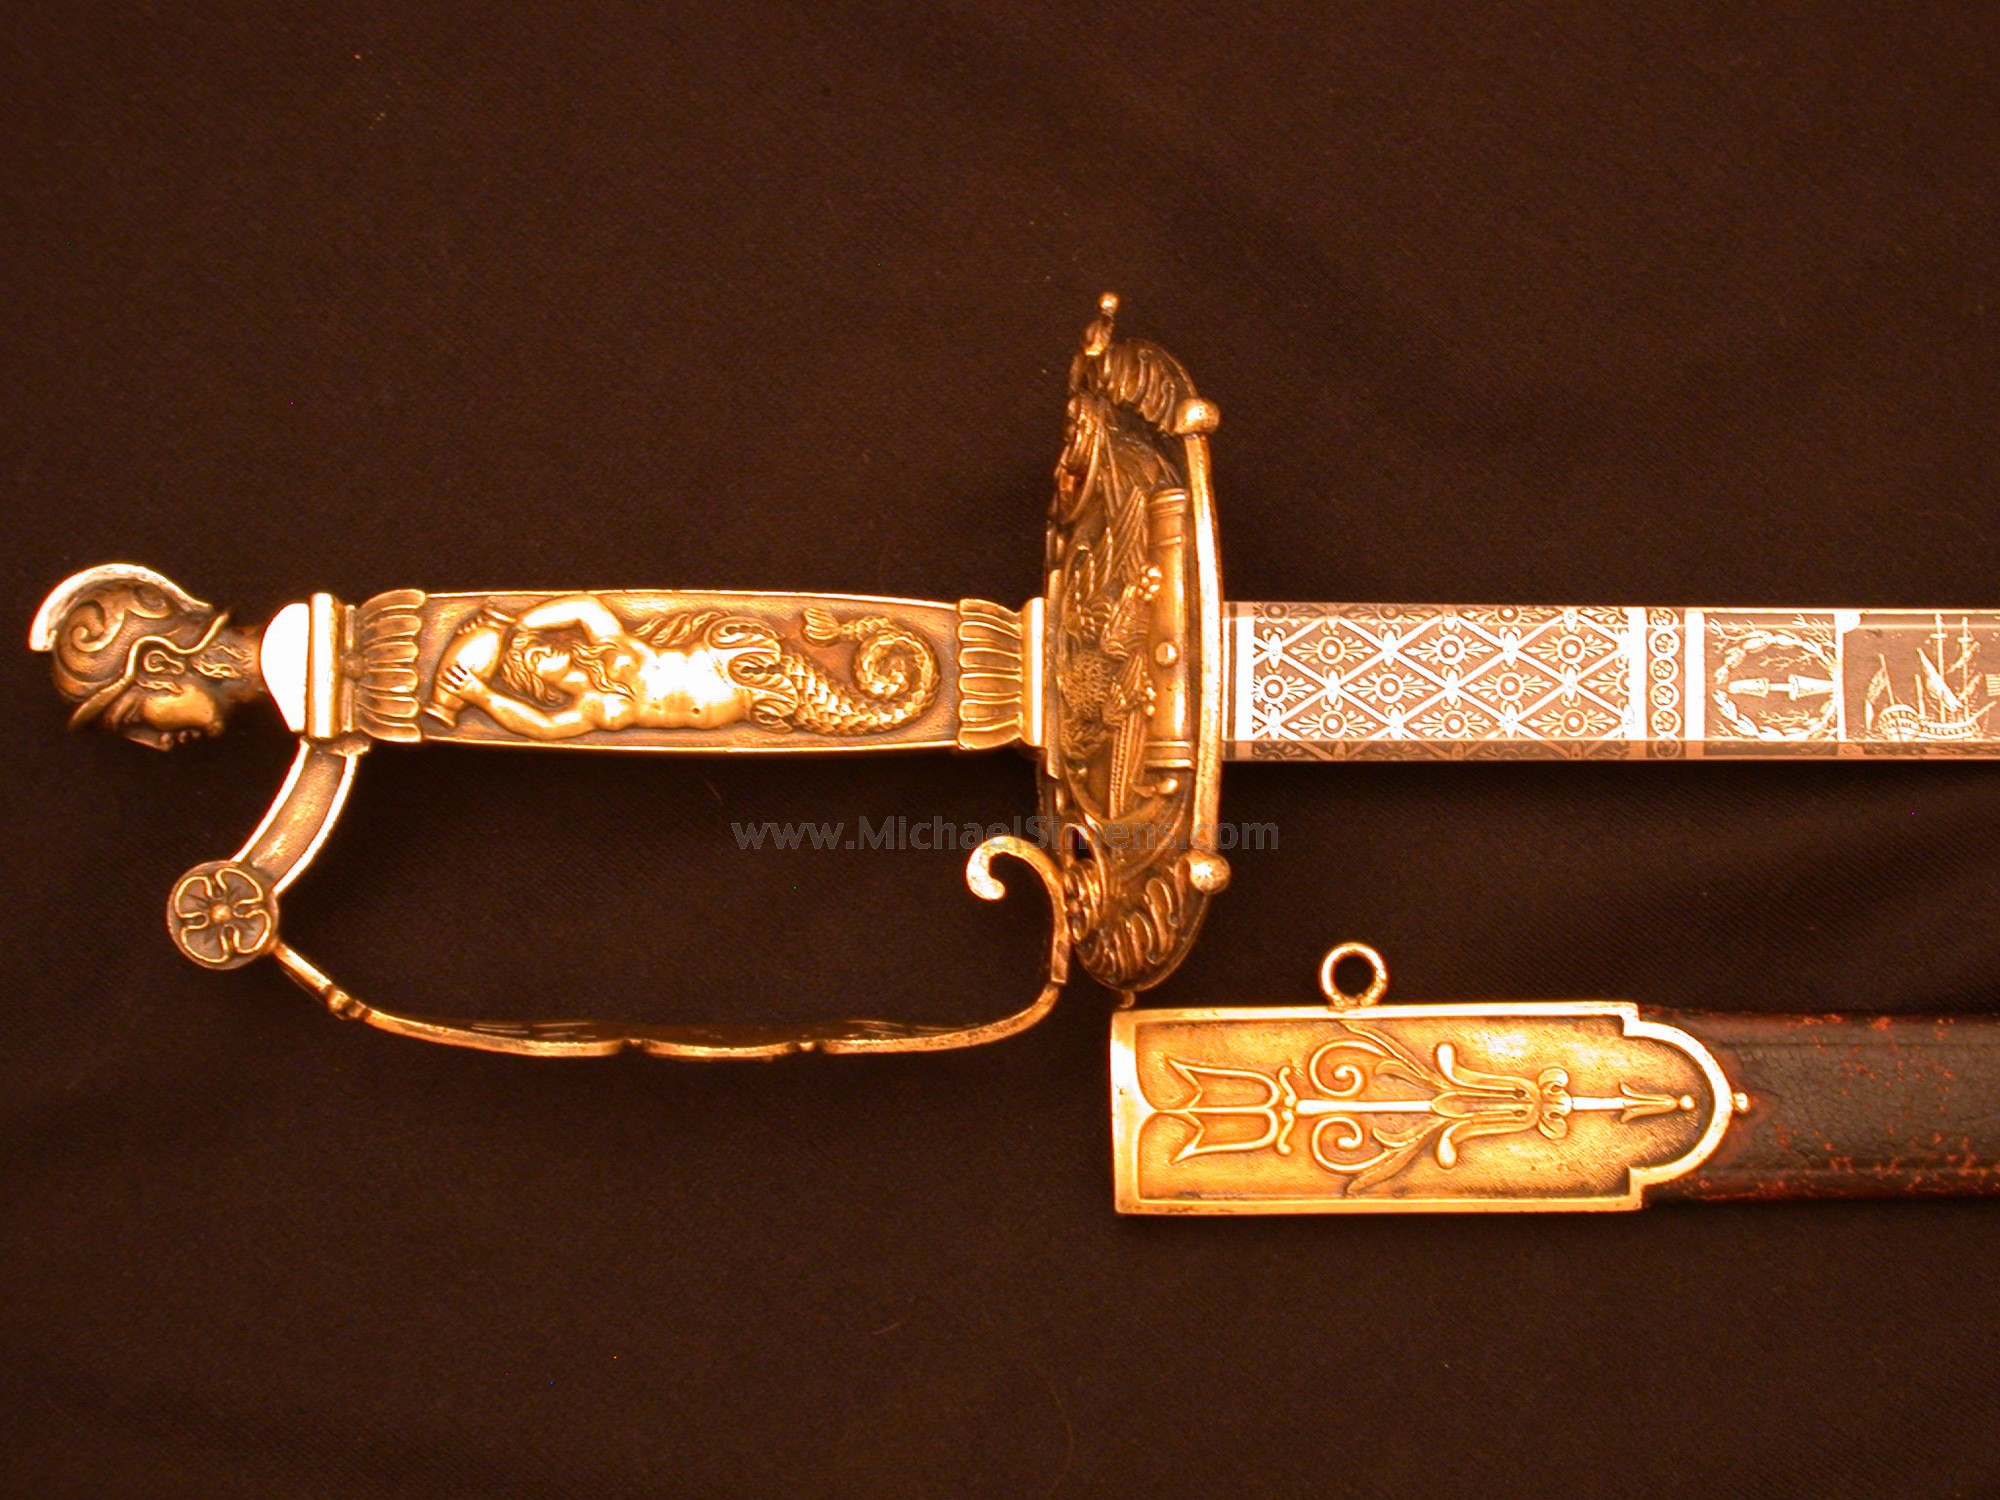 WAR OF 1812 CONGRESSIONAL PRESENTATION SWORD - NAVAL